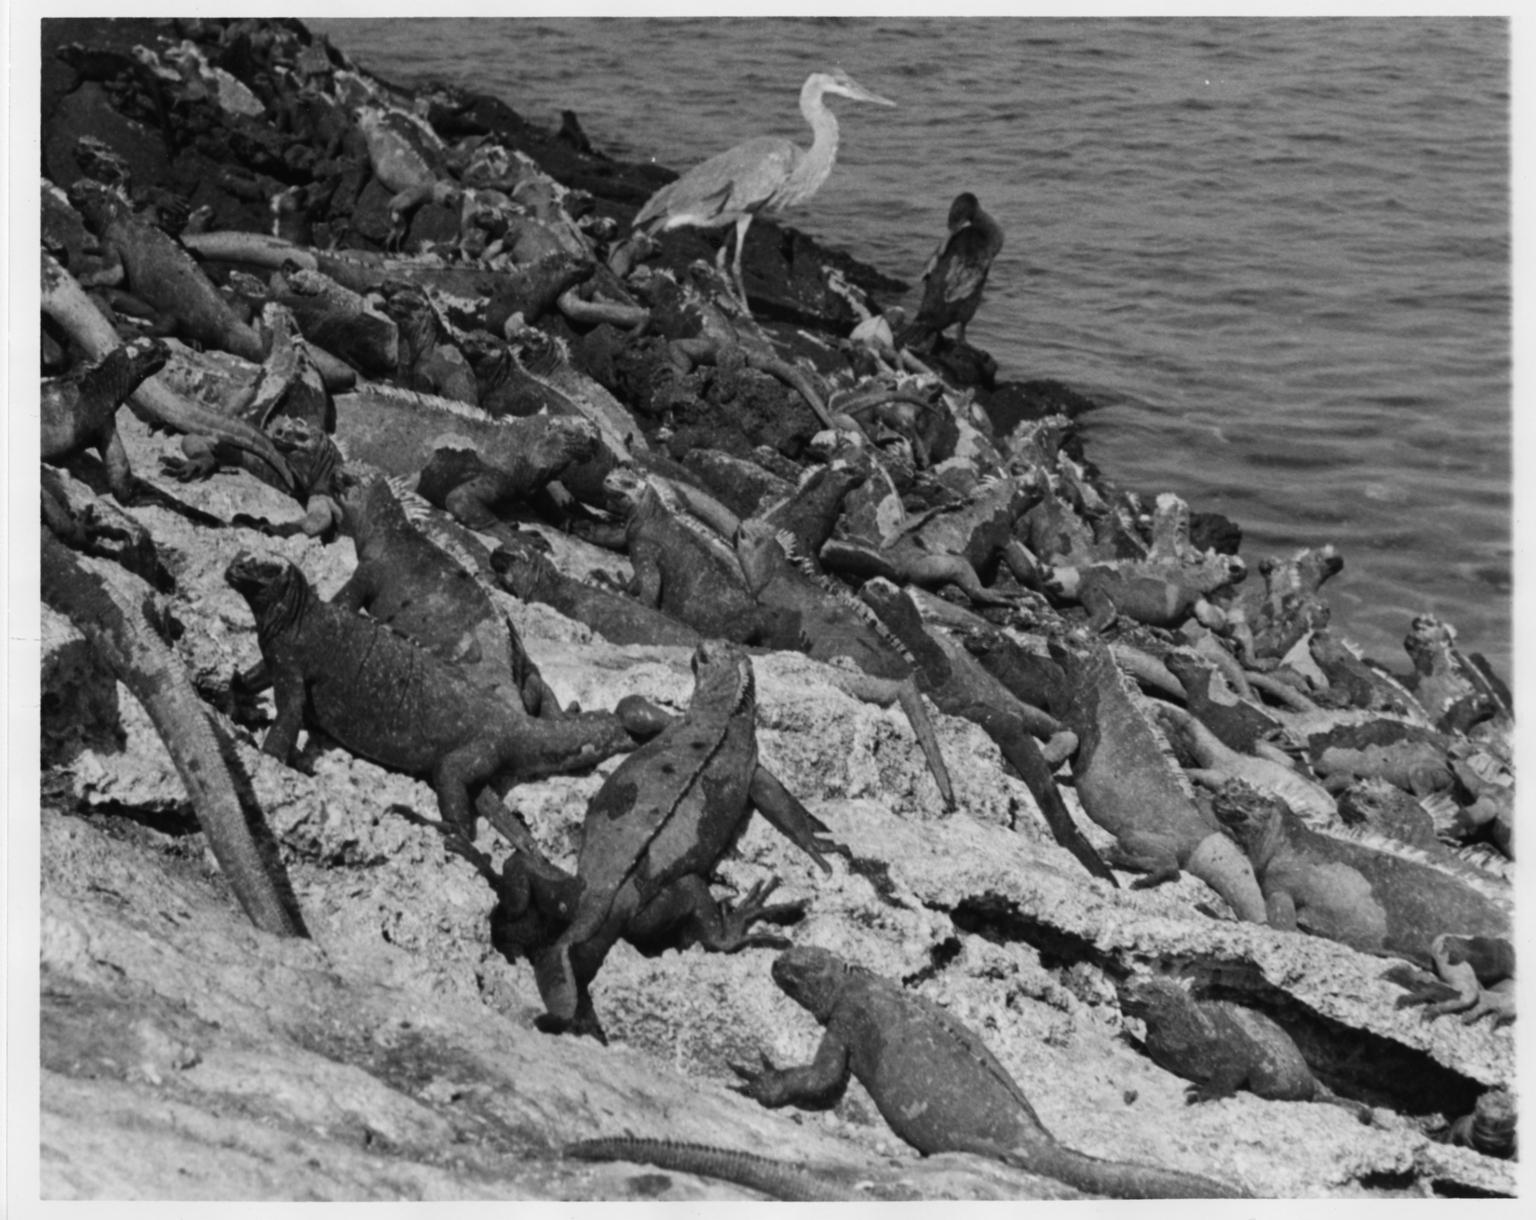 Mess of Marine Iguana